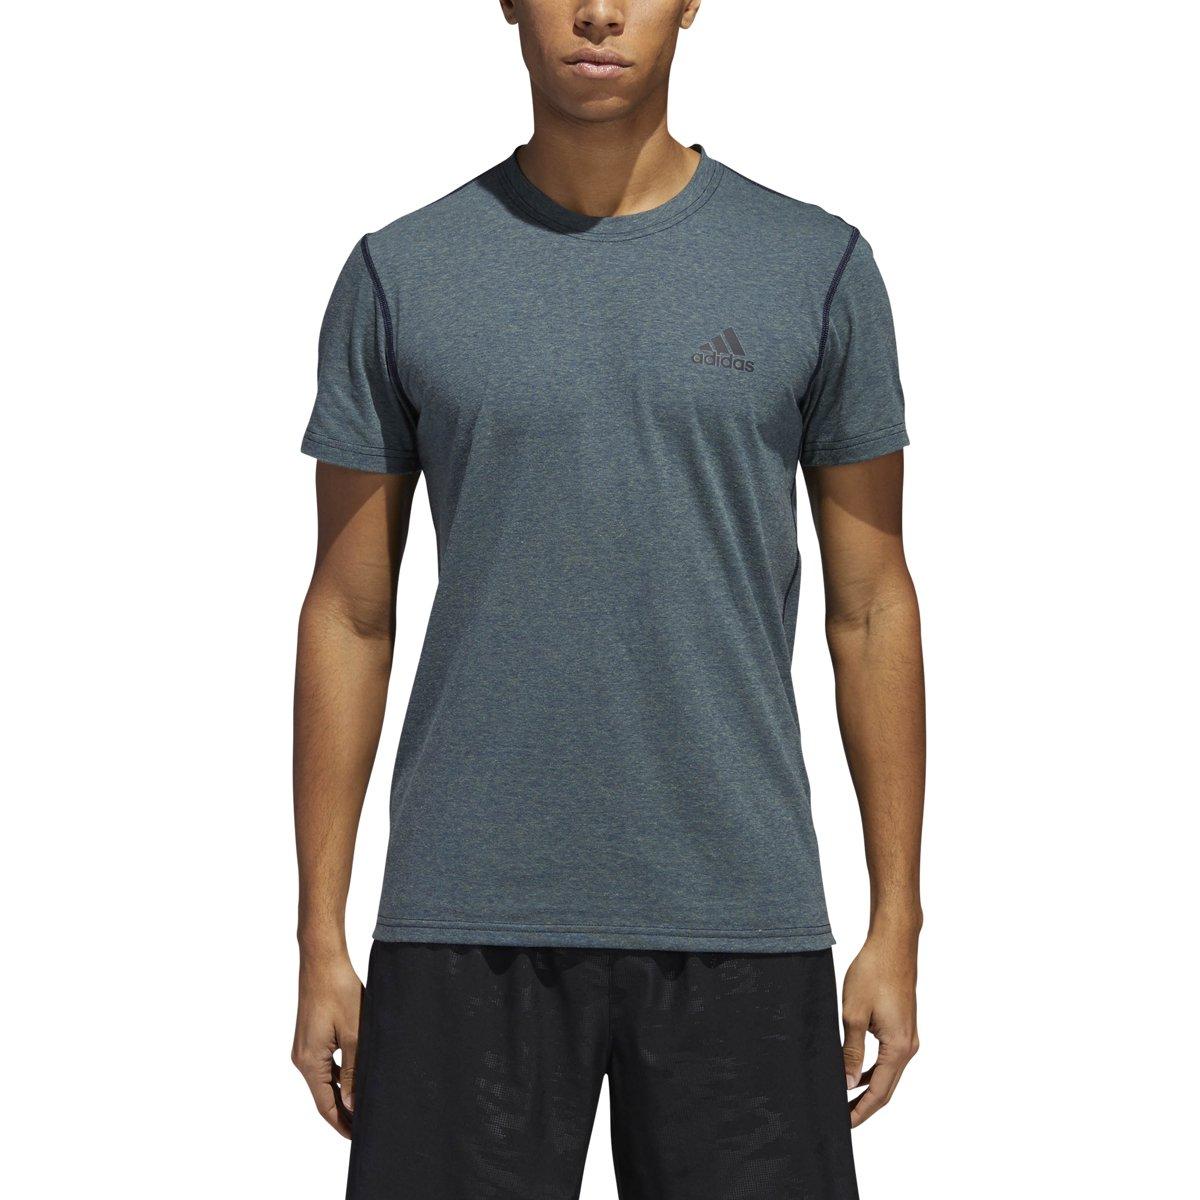 Adidas Men's Ultimate Short Sleeve T Shirt